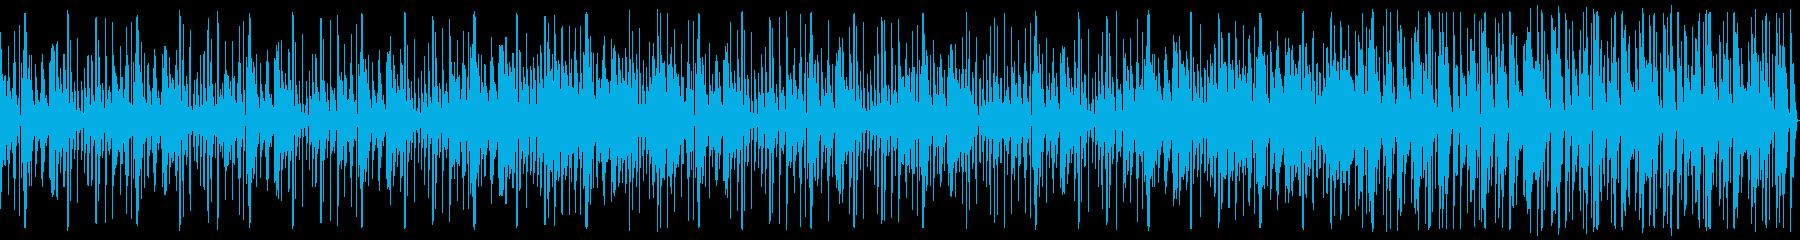 KANTスリリングリズム130_2の再生済みの波形